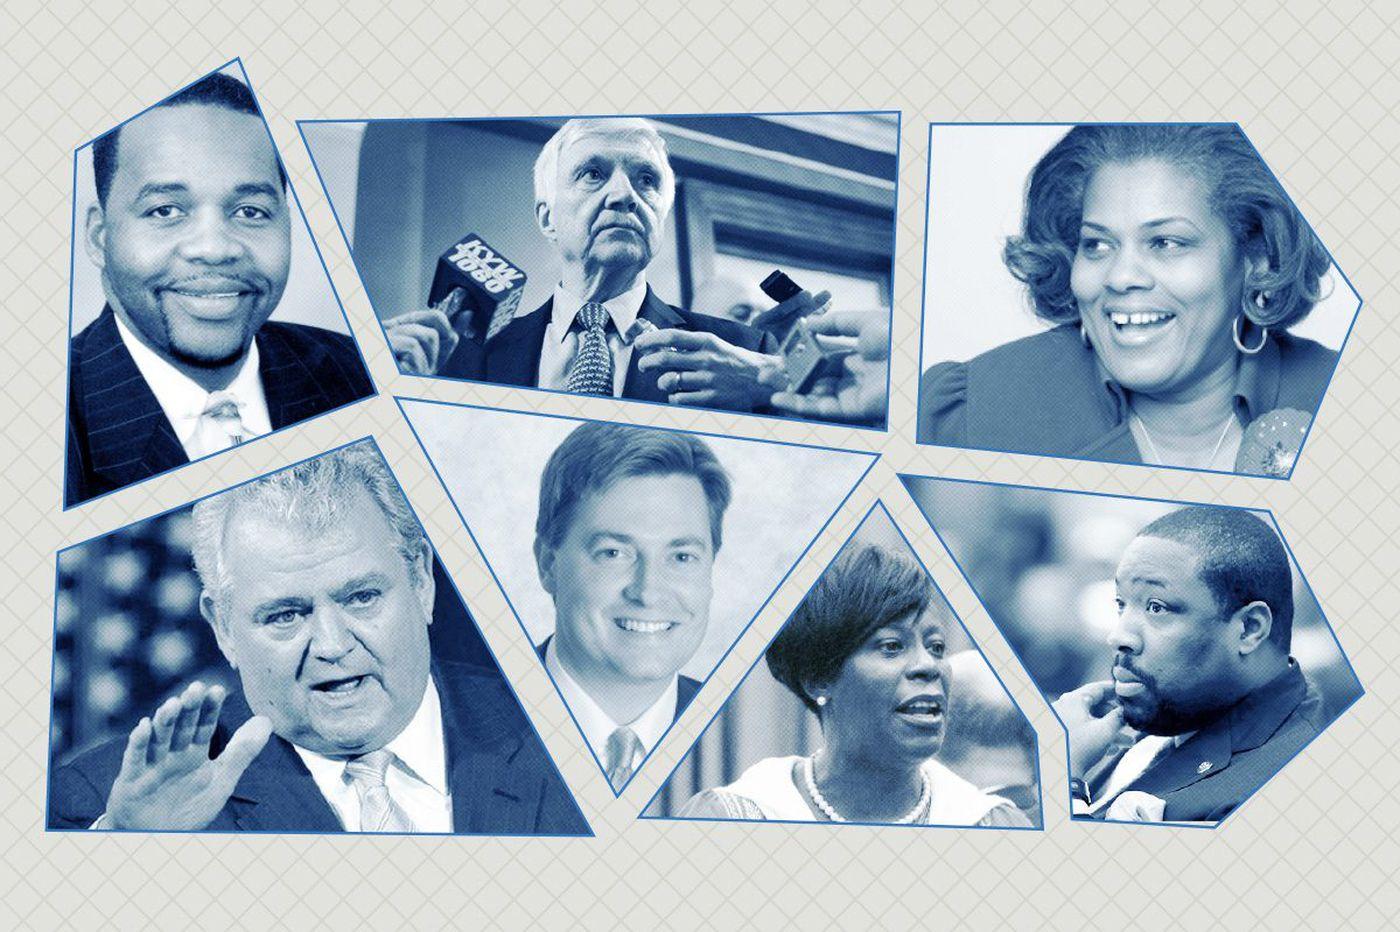 Pa. gerrymandering's surprise co-conspirators: Democrats